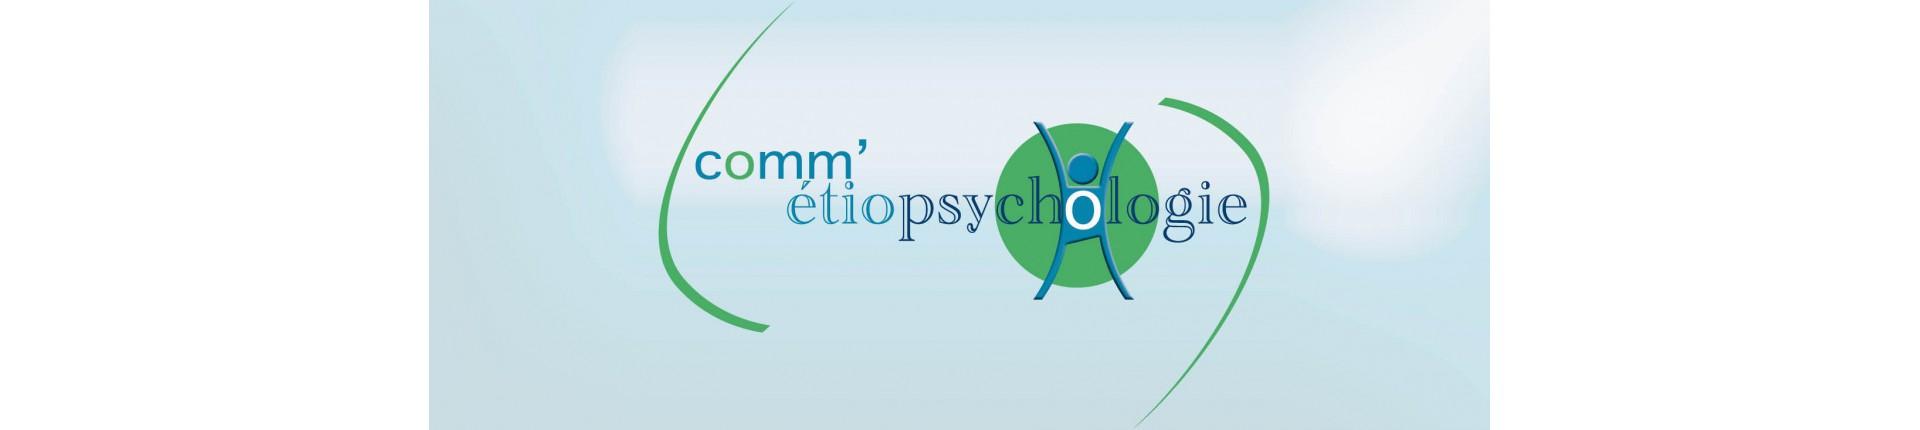 Ecole Etiopsychologie Shop